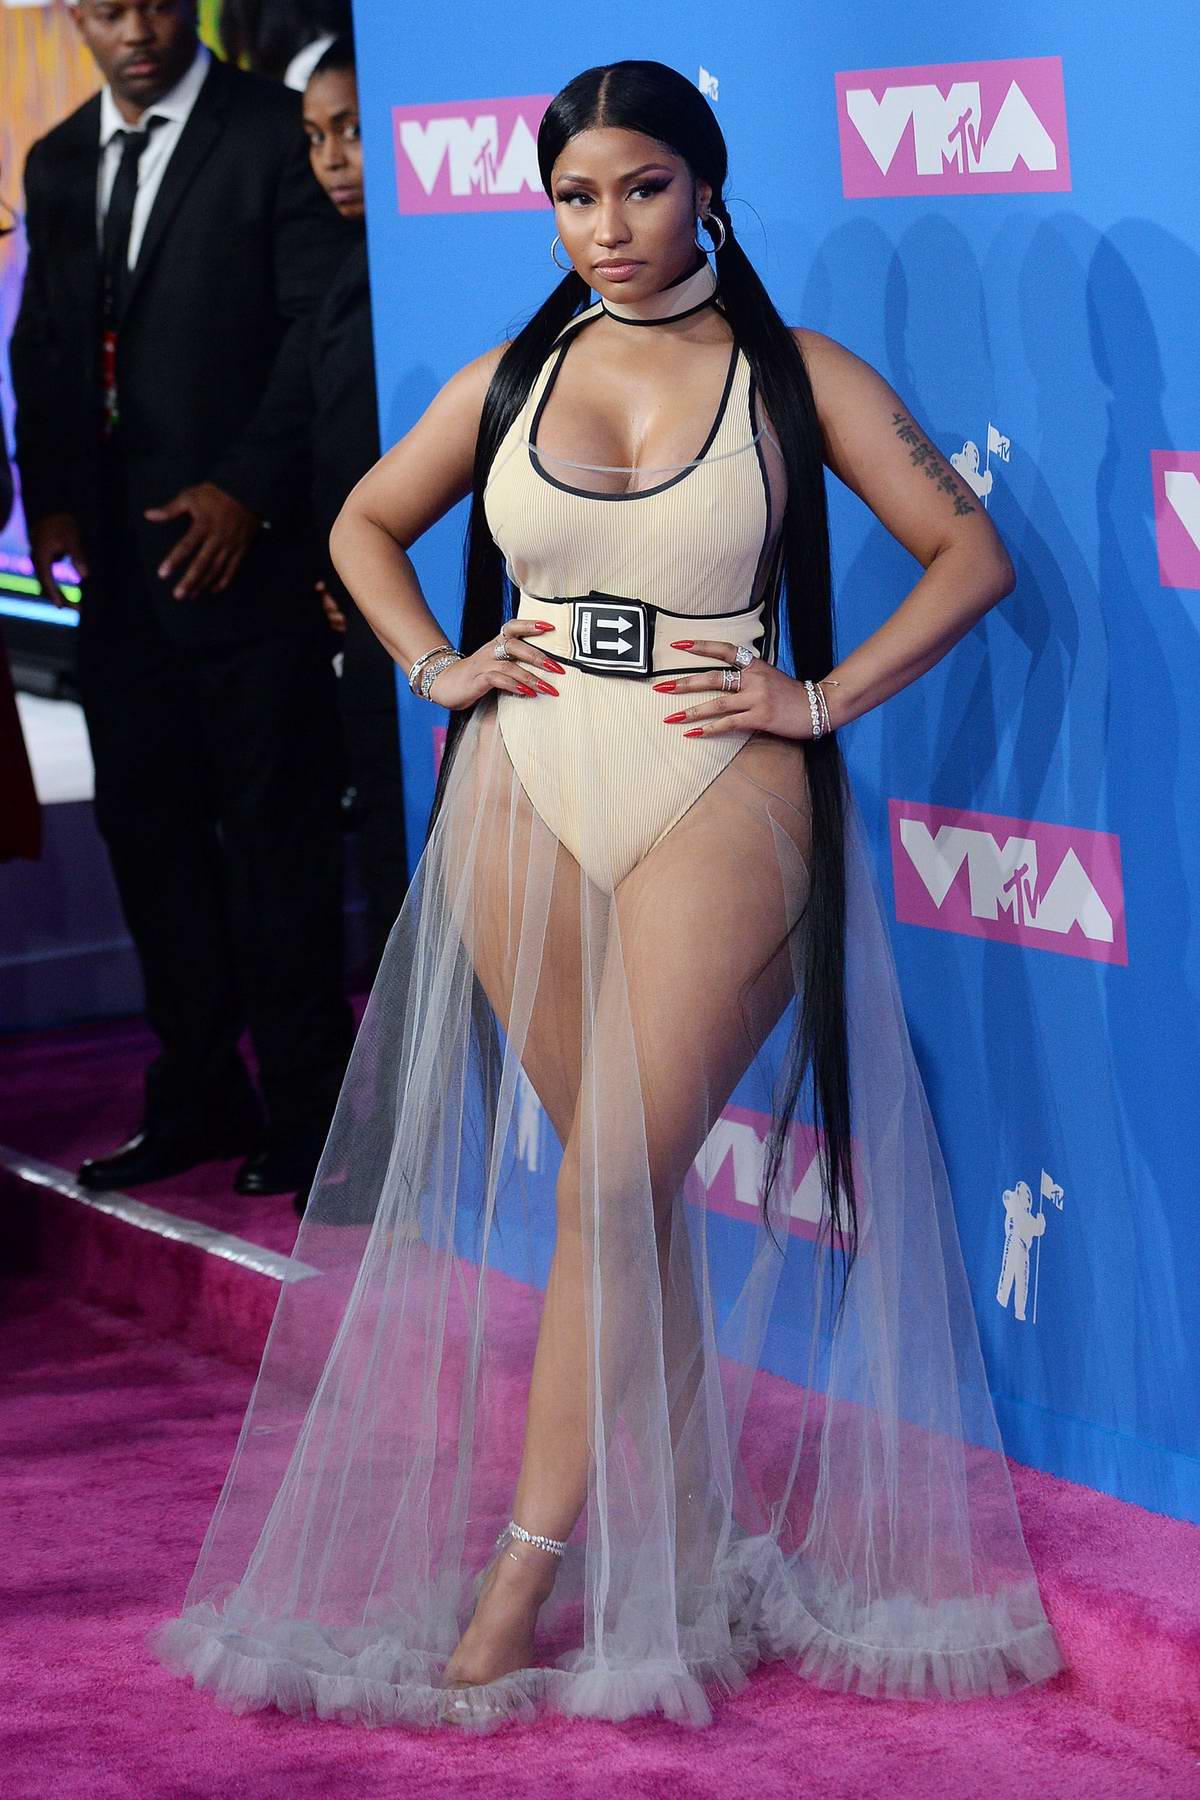 Nicki Minaj attends 2018 MTV Video Music Awards (MTV VMA 2018) at Radio City Music Hall in New York City